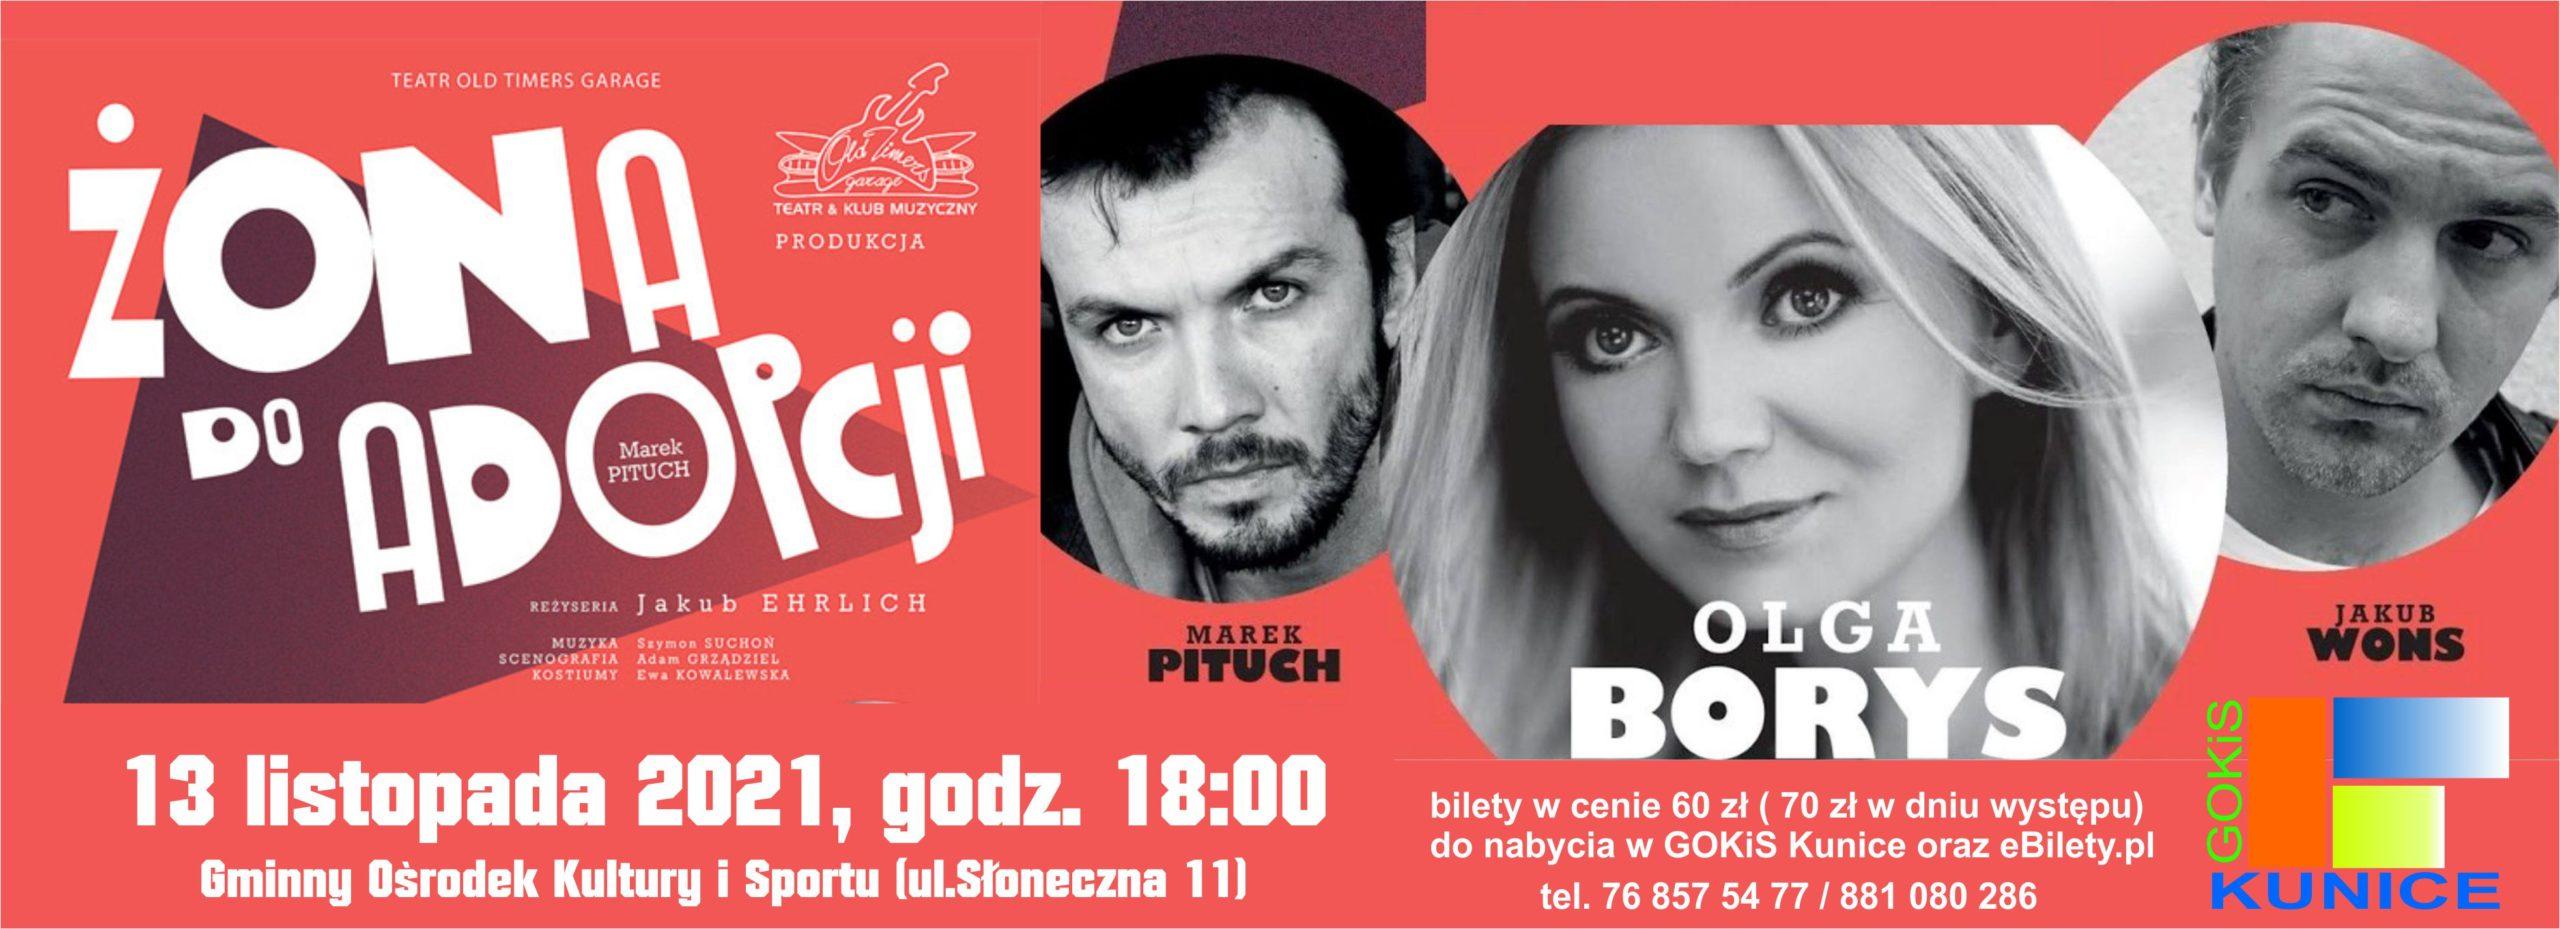 https://www.ebilet.pl/teatr/komedia/zona-do-adopcji/